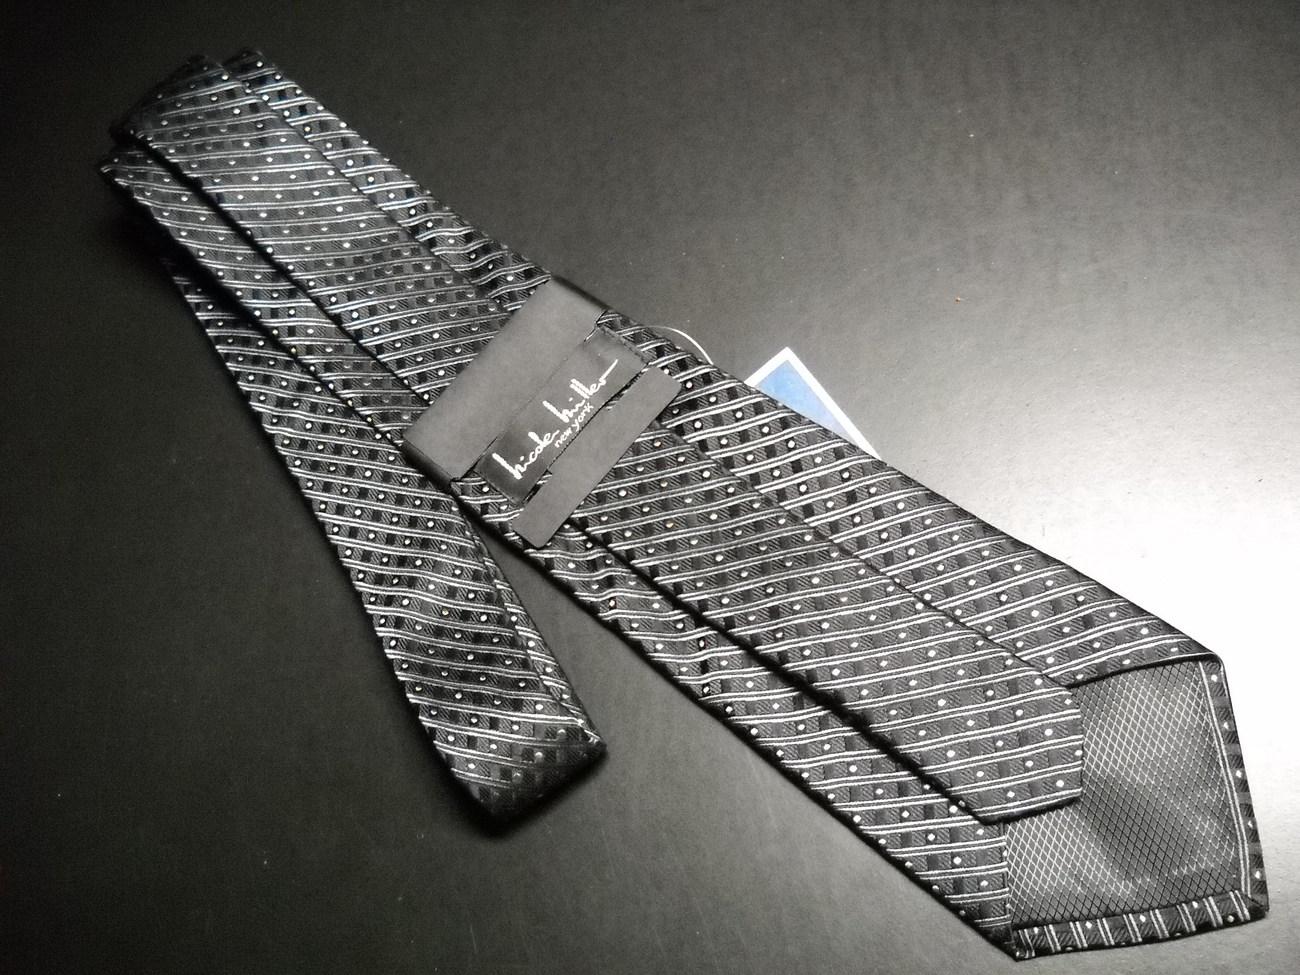 Nicole Miller Neck Tie Black Diagonal Stripes Blue Gold Accents Unworn in Sleeve